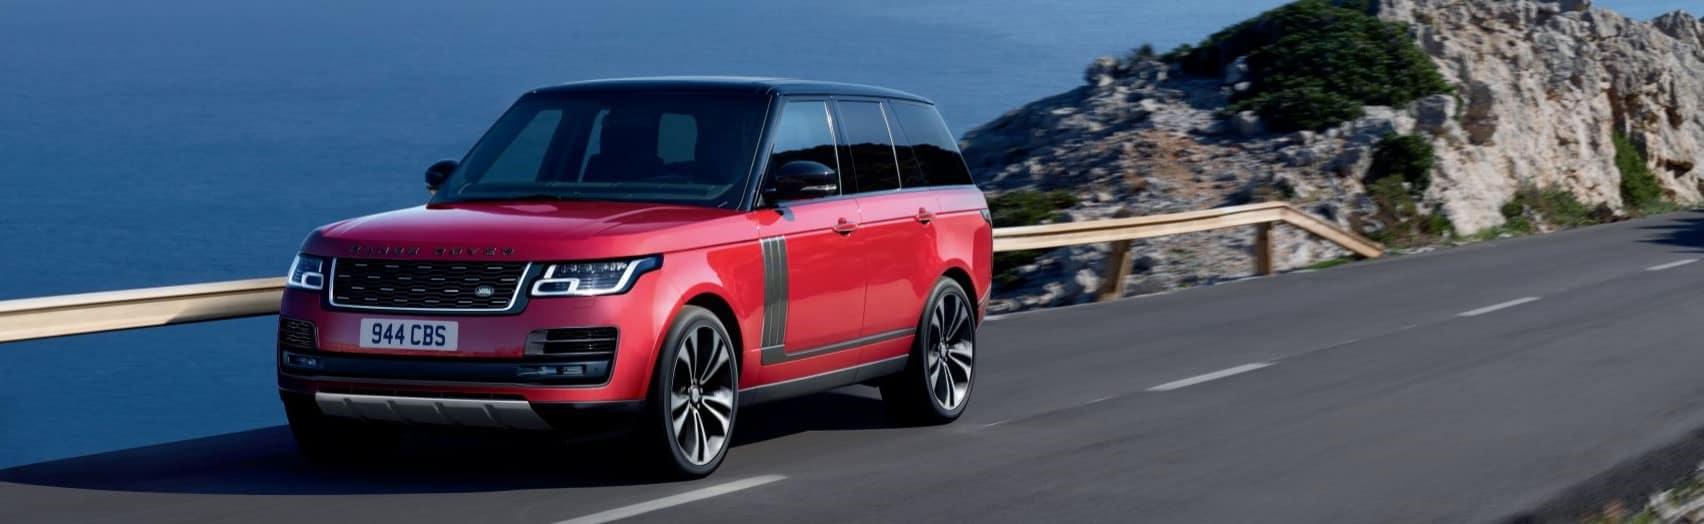 Range Rover Sport Interior >> Range Rover Sport Interior Land Rover Albuquerque Nm